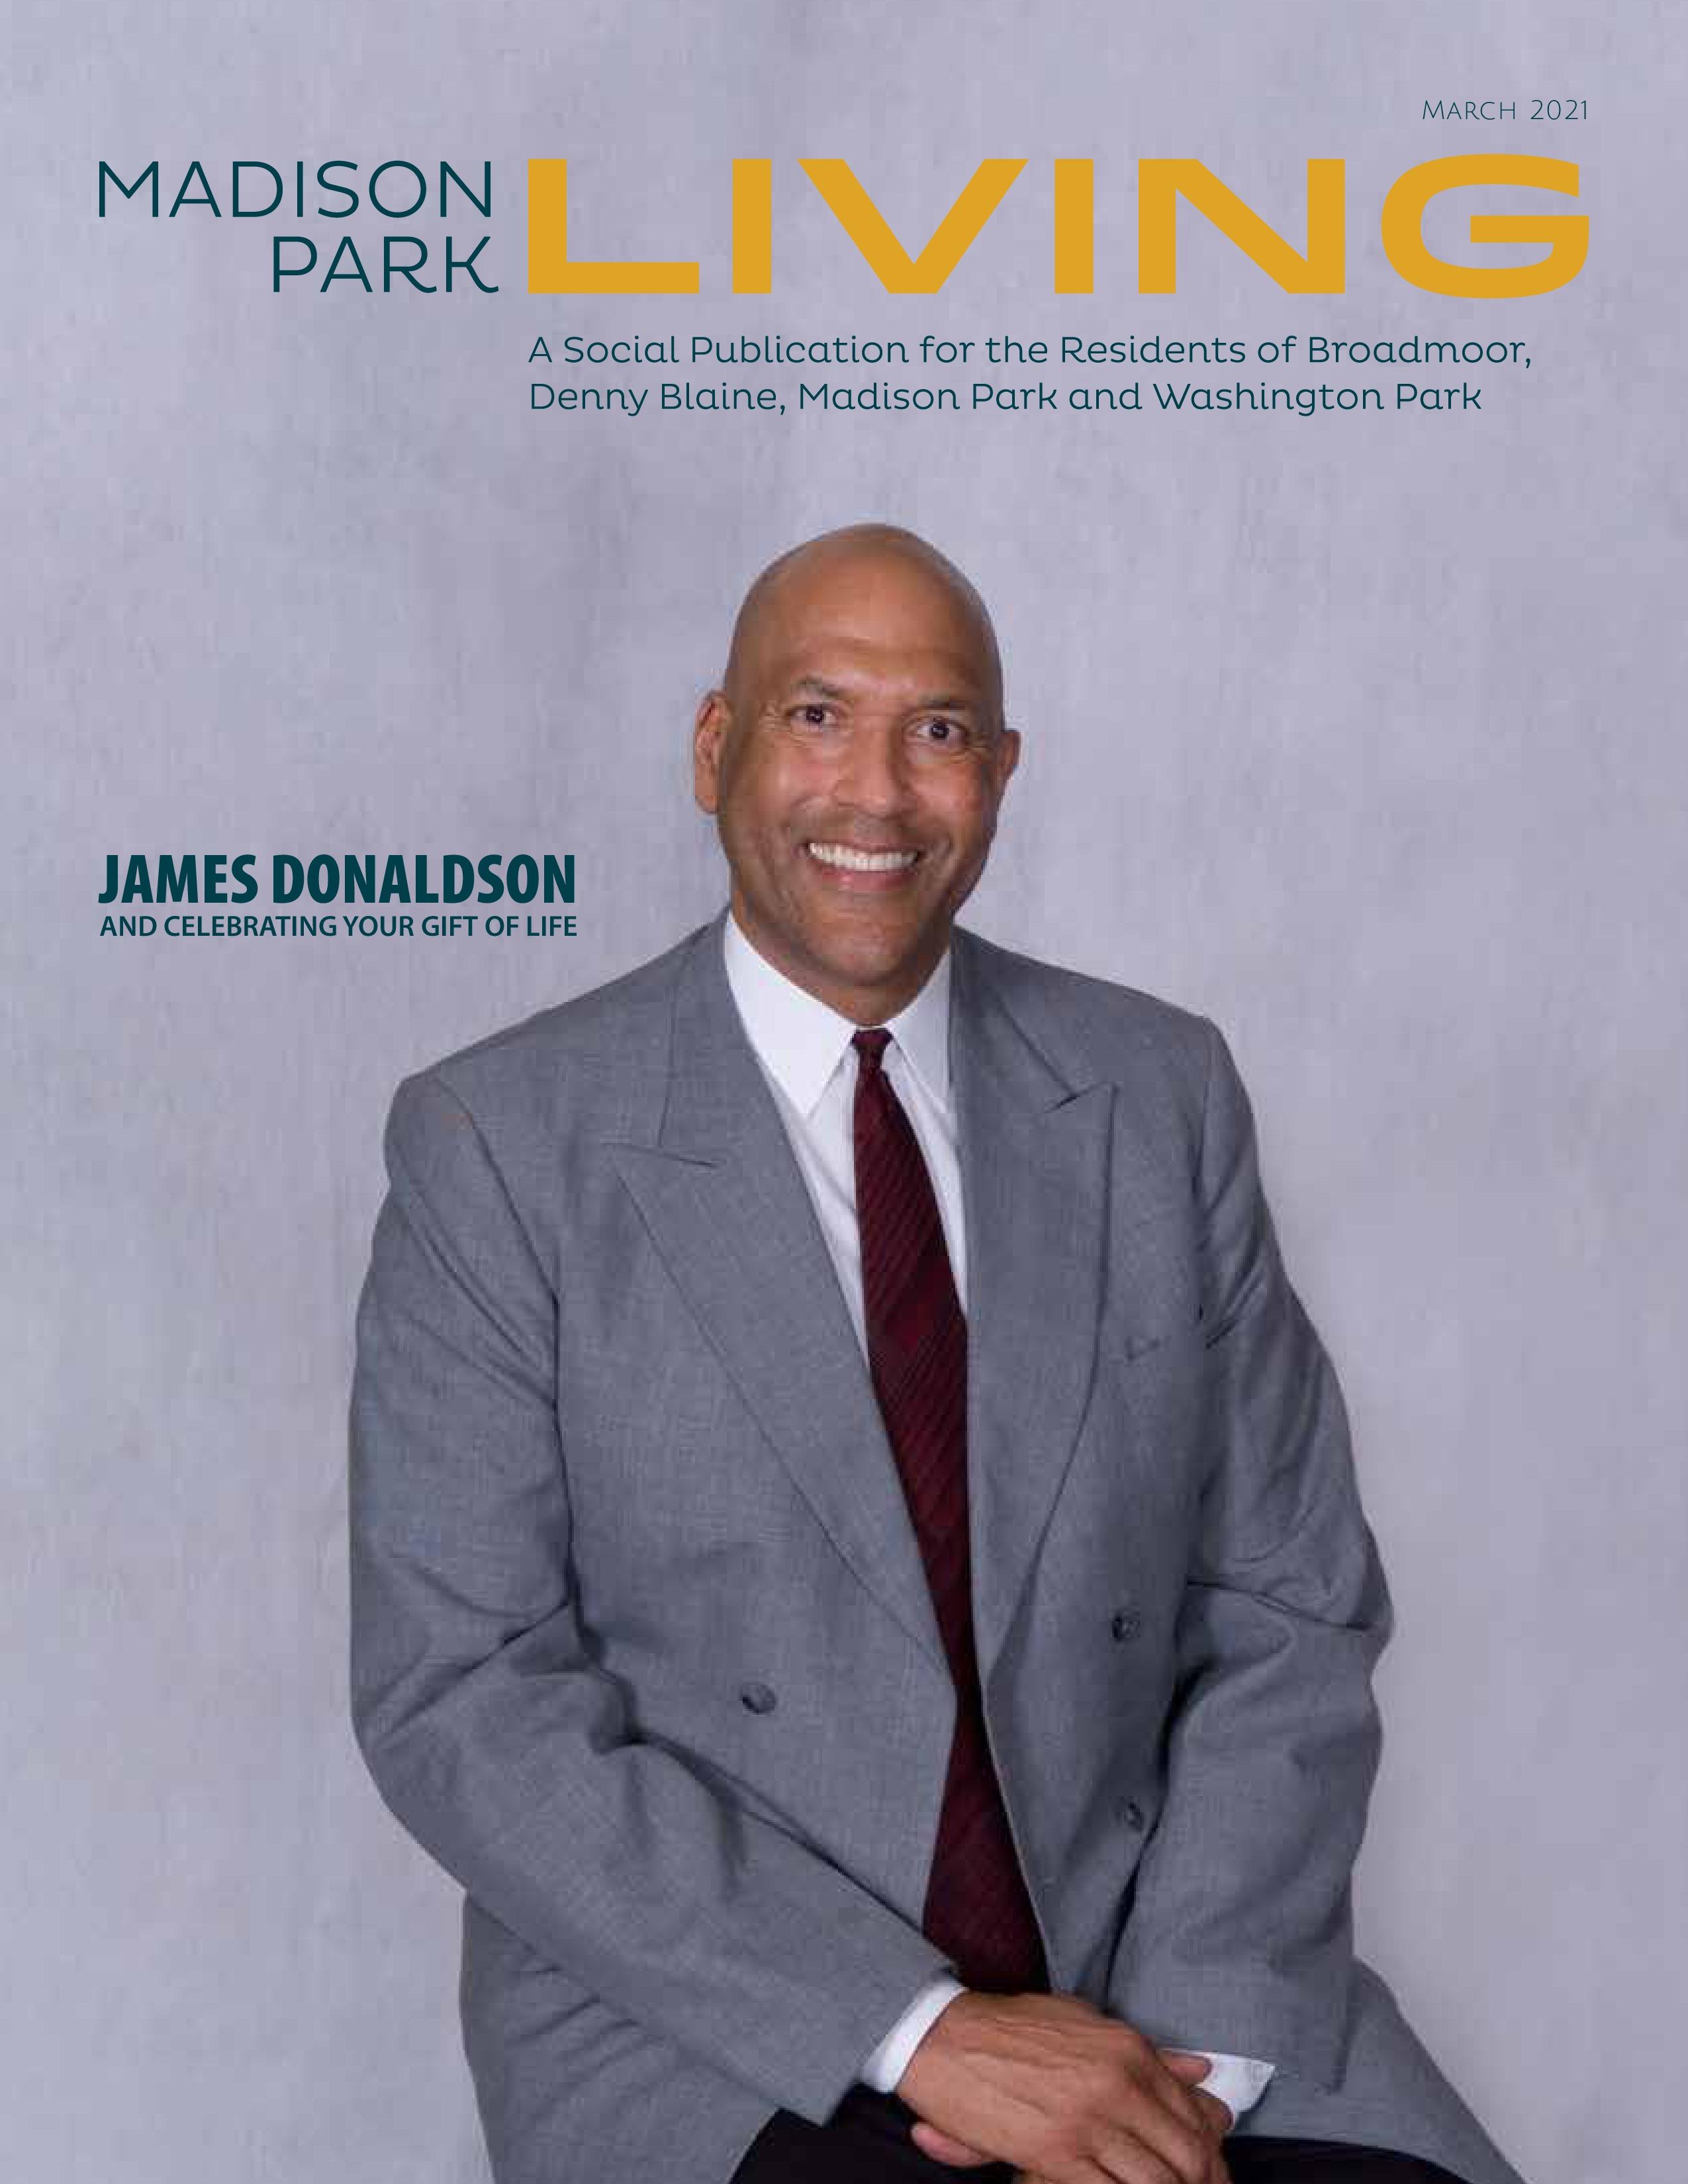 Madison Park Living 2021-03-01